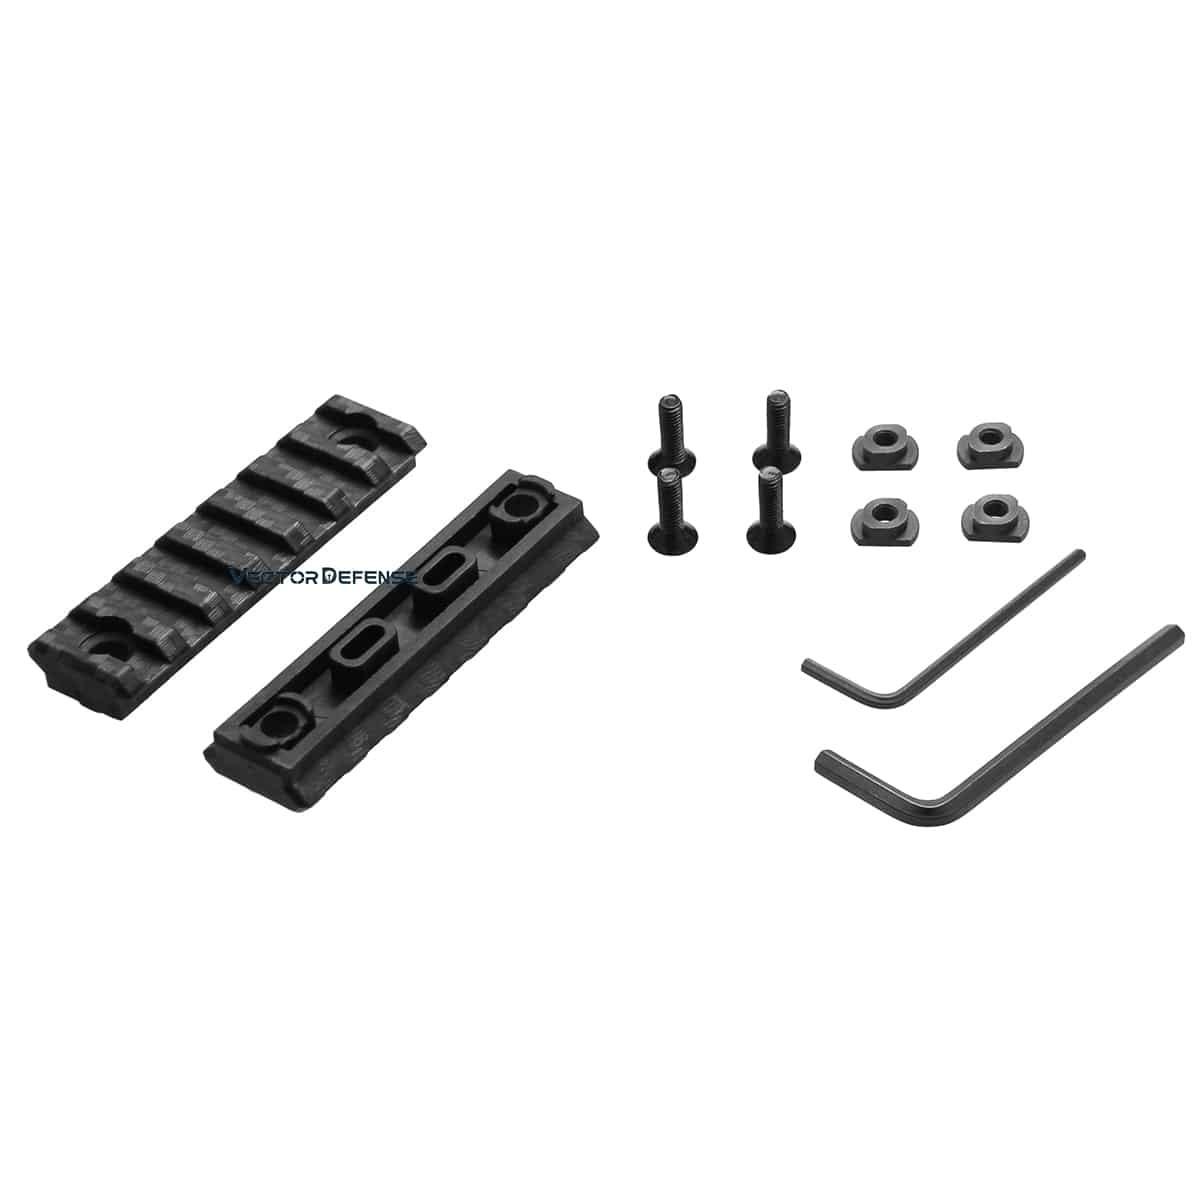 MLOK Carbon Fiber Polymer 15